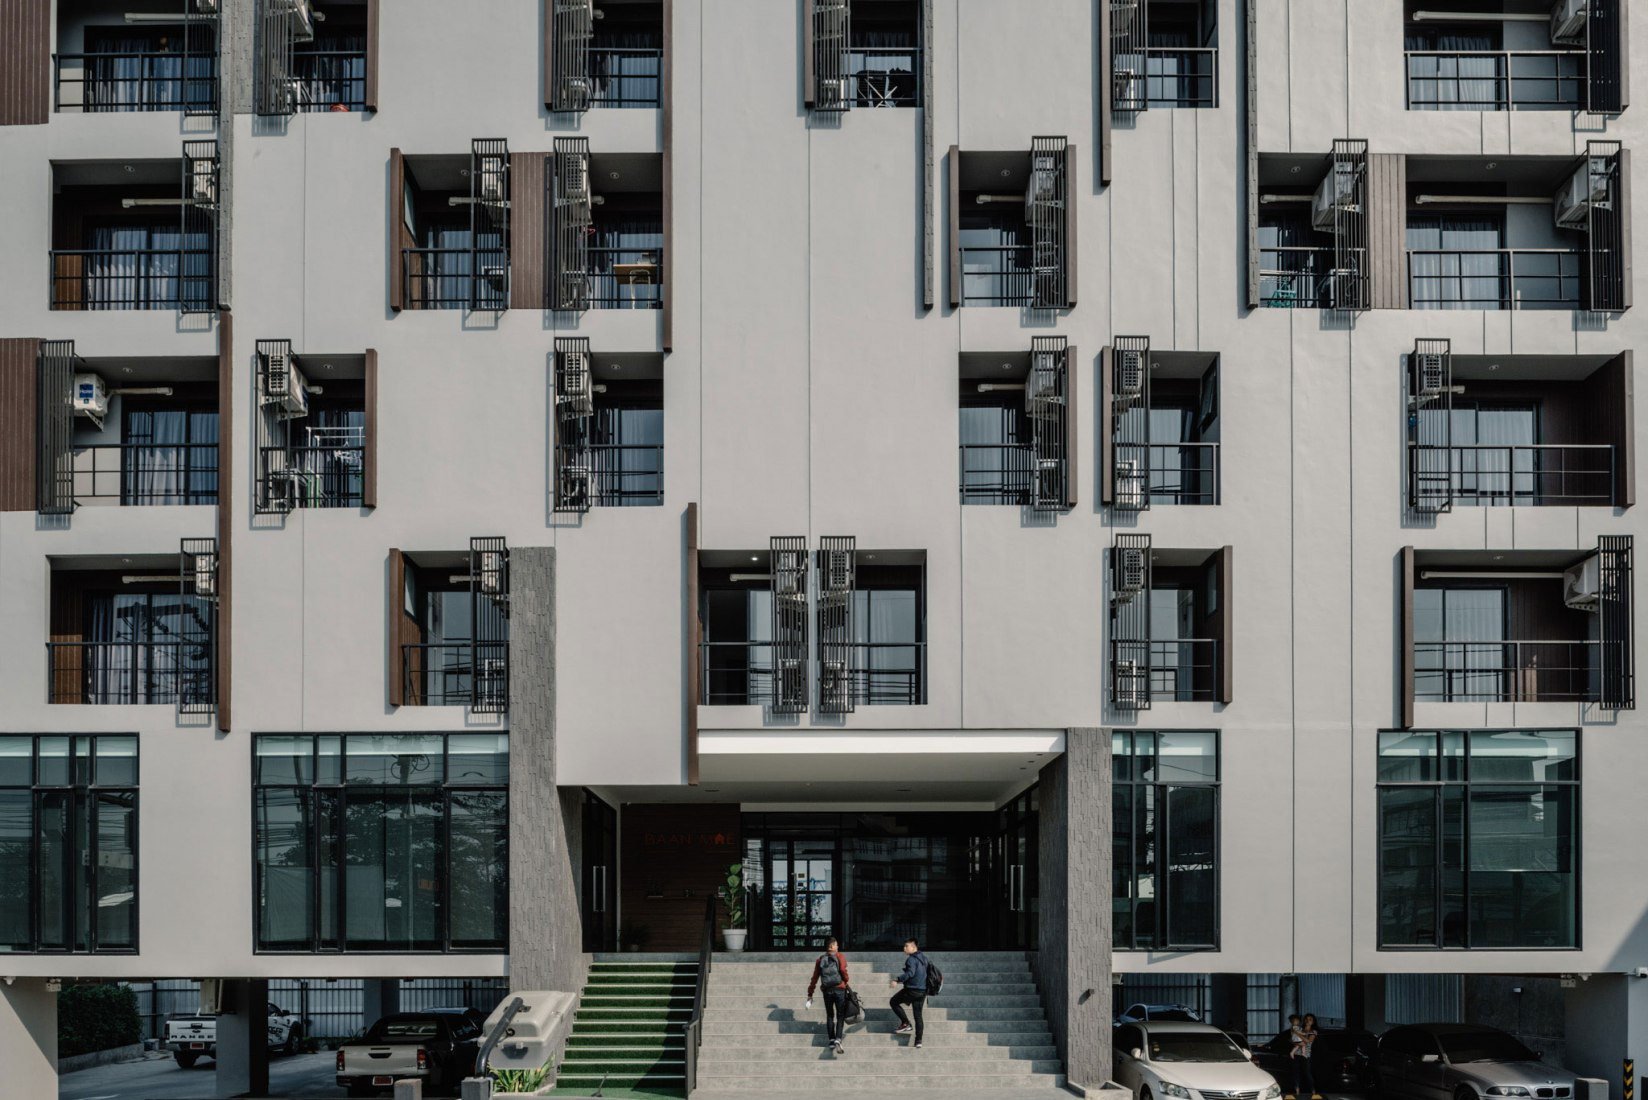 Apartamentos Latkrabang por Archimontage Design Fields Sophisticated. Fotografía por Chaovarith Poonphol Photography.